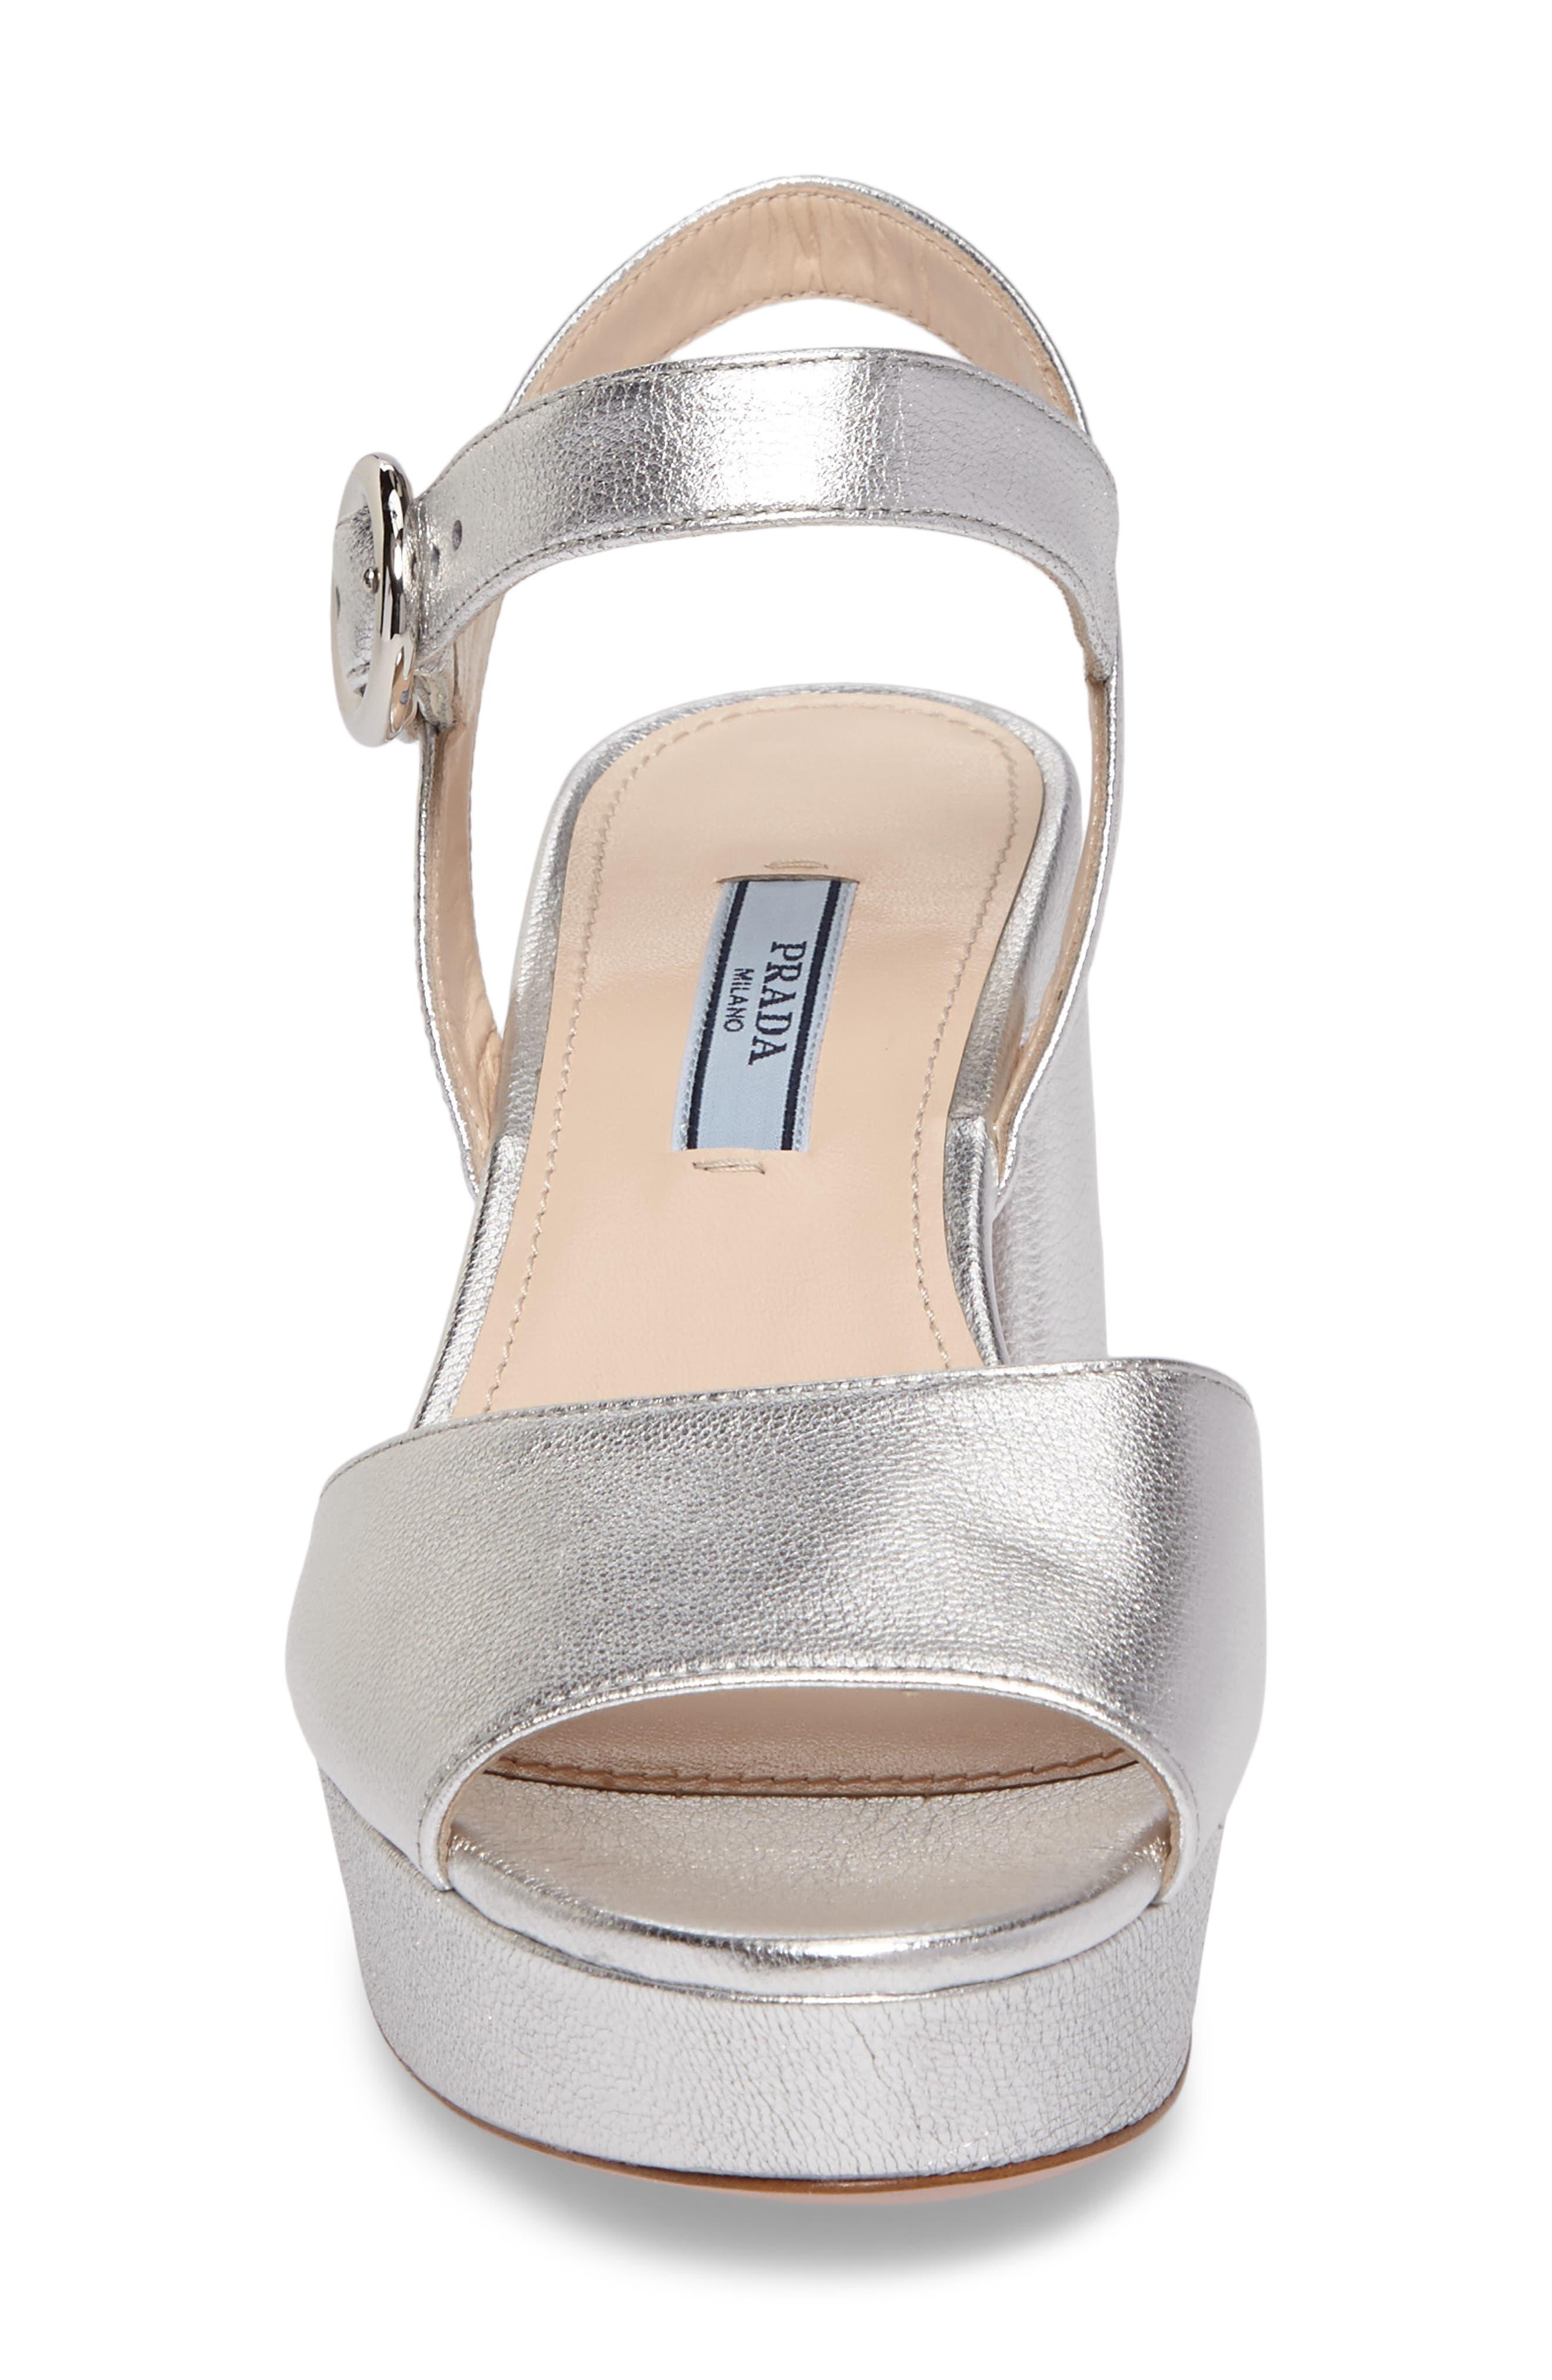 Ankle Strap Platform Sandal,                             Alternate thumbnail 4, color,                             Silver